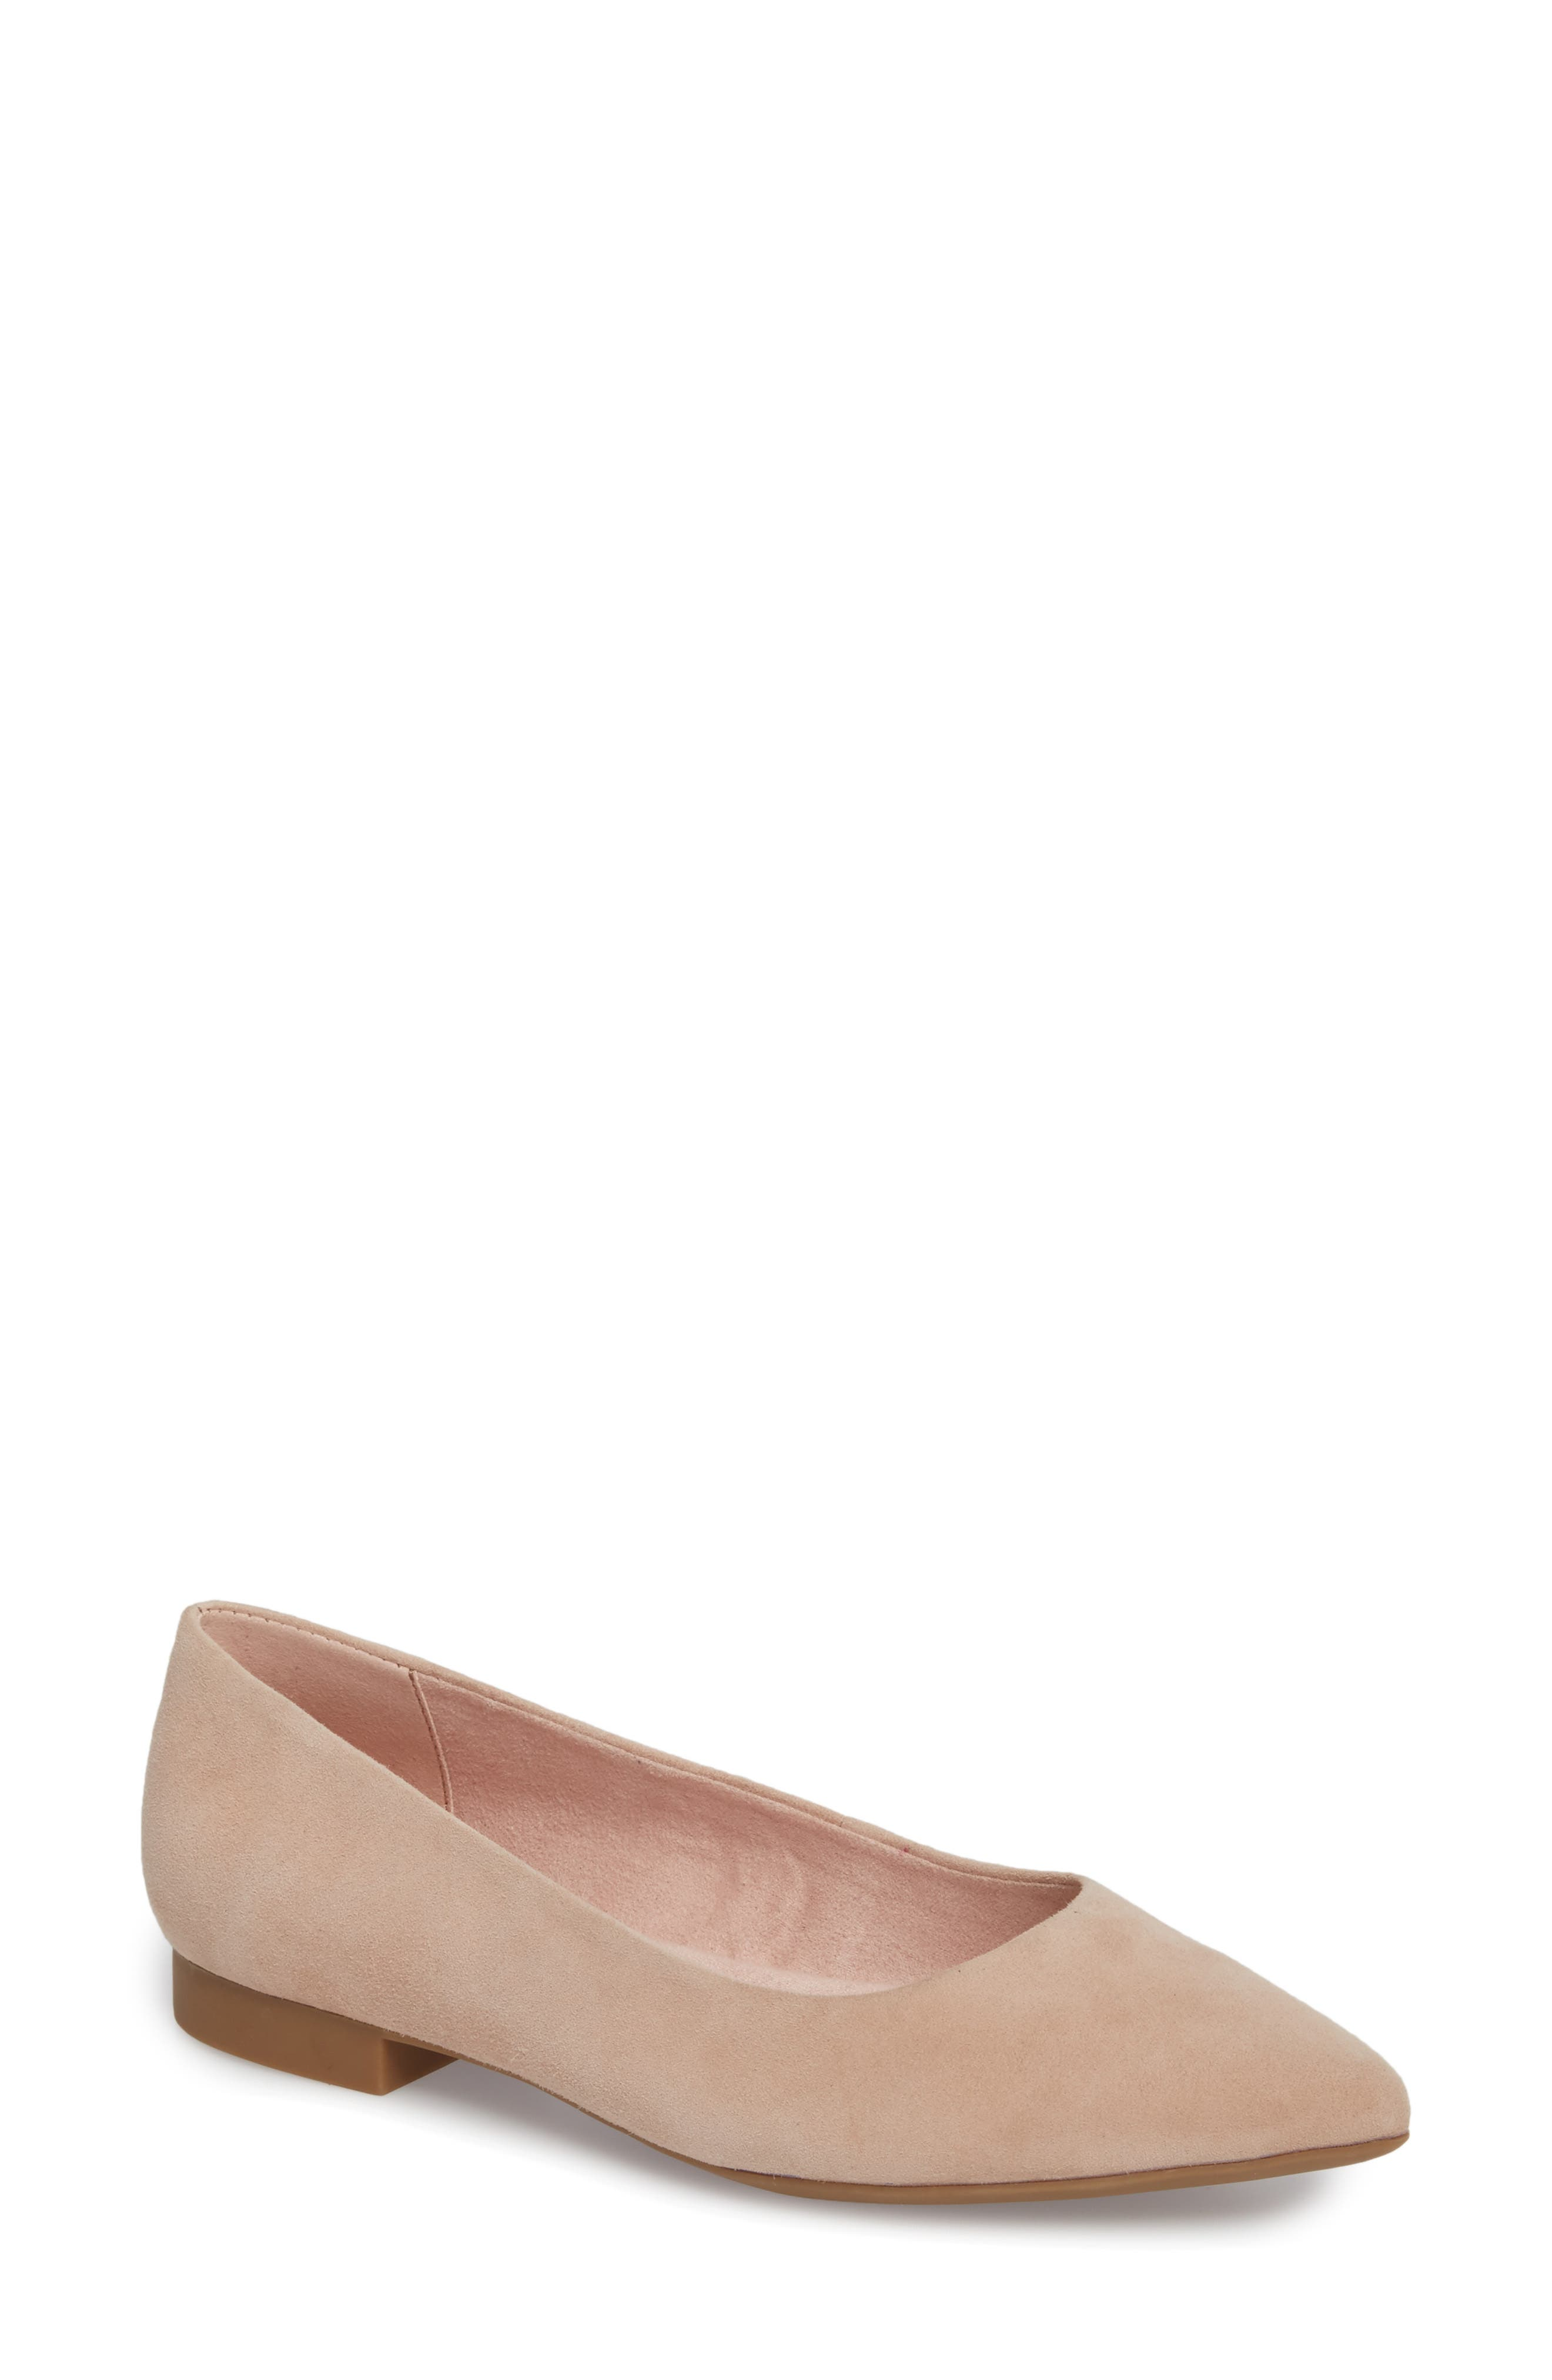 BELLA VITA, 'Vivien' Pointy Toe Flat, Main thumbnail 1, color, BLUSH SUEDE